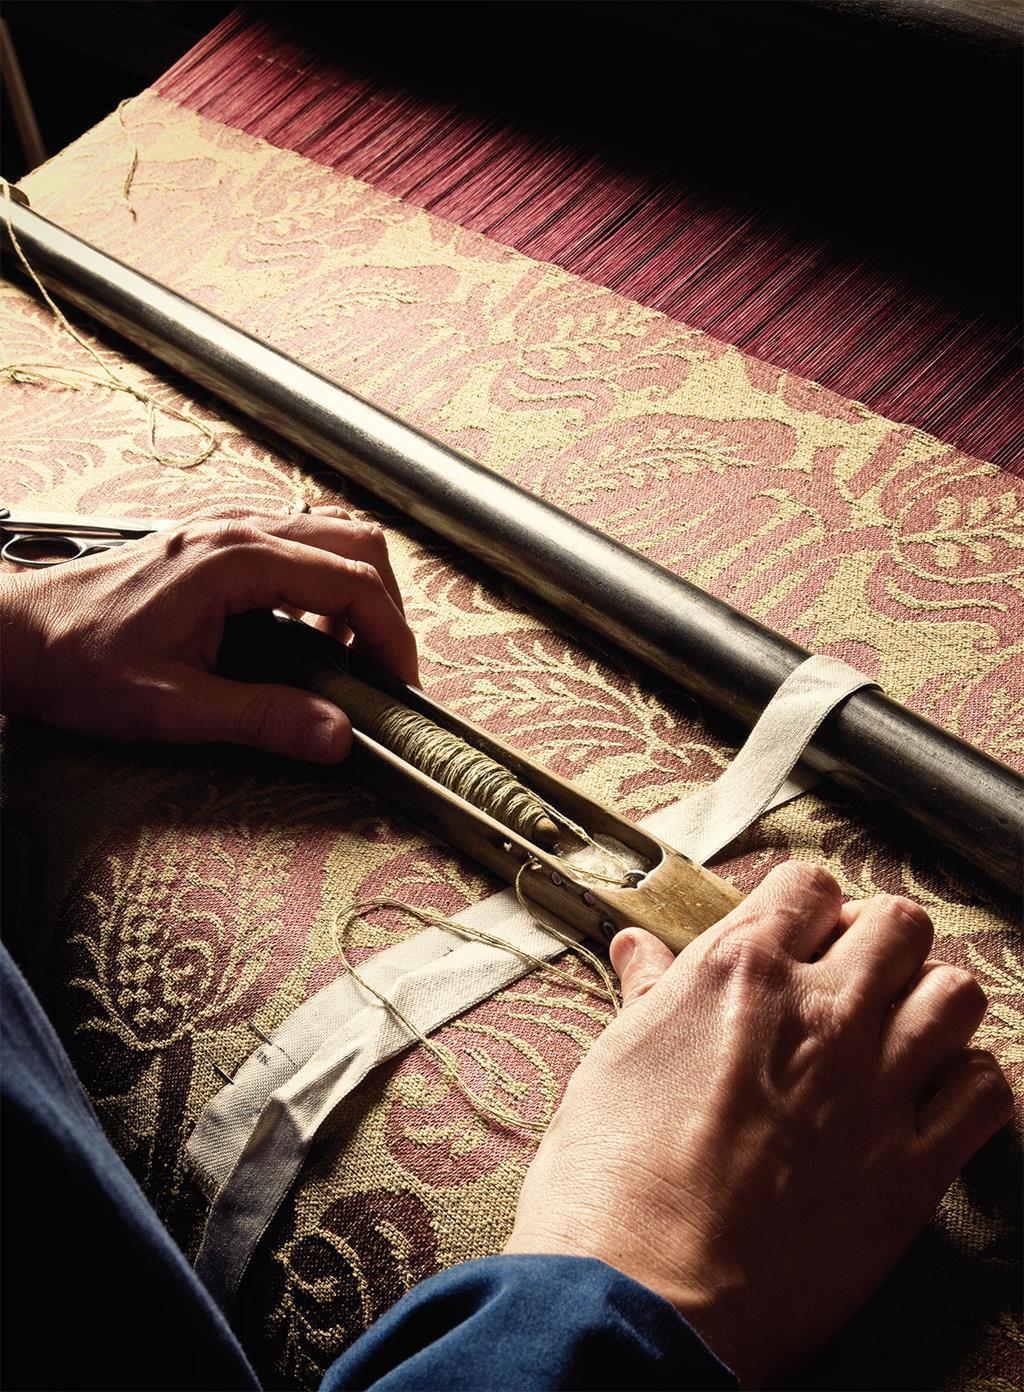 antico-setificio-fiorentino-silk-store-florence-detail.jpg